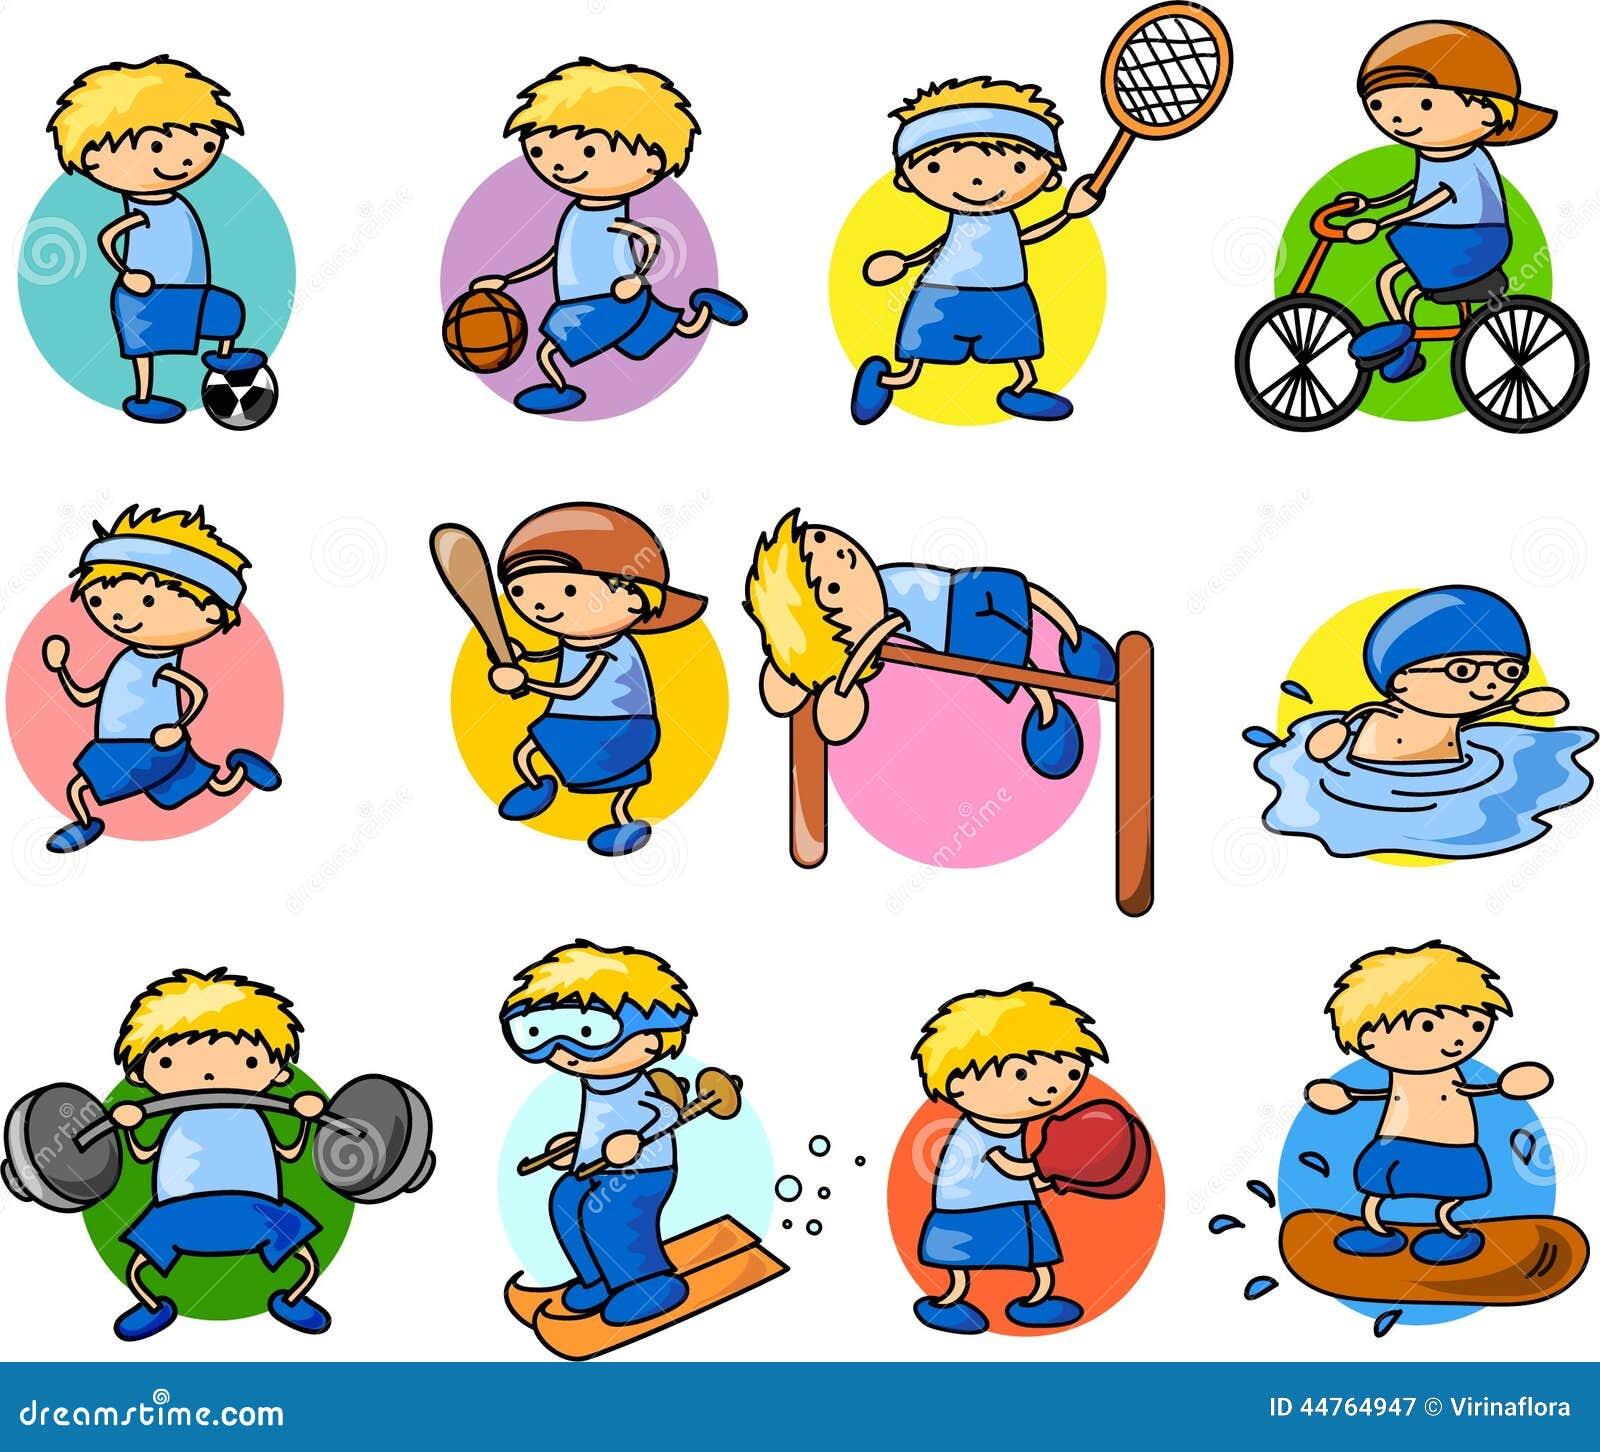 cartoon sport deporte dibujos animados icon pictogram icono vector het fumetto icona deportes tecknad deportivos stockillustratie depositphotos motrices habilidades dibujo